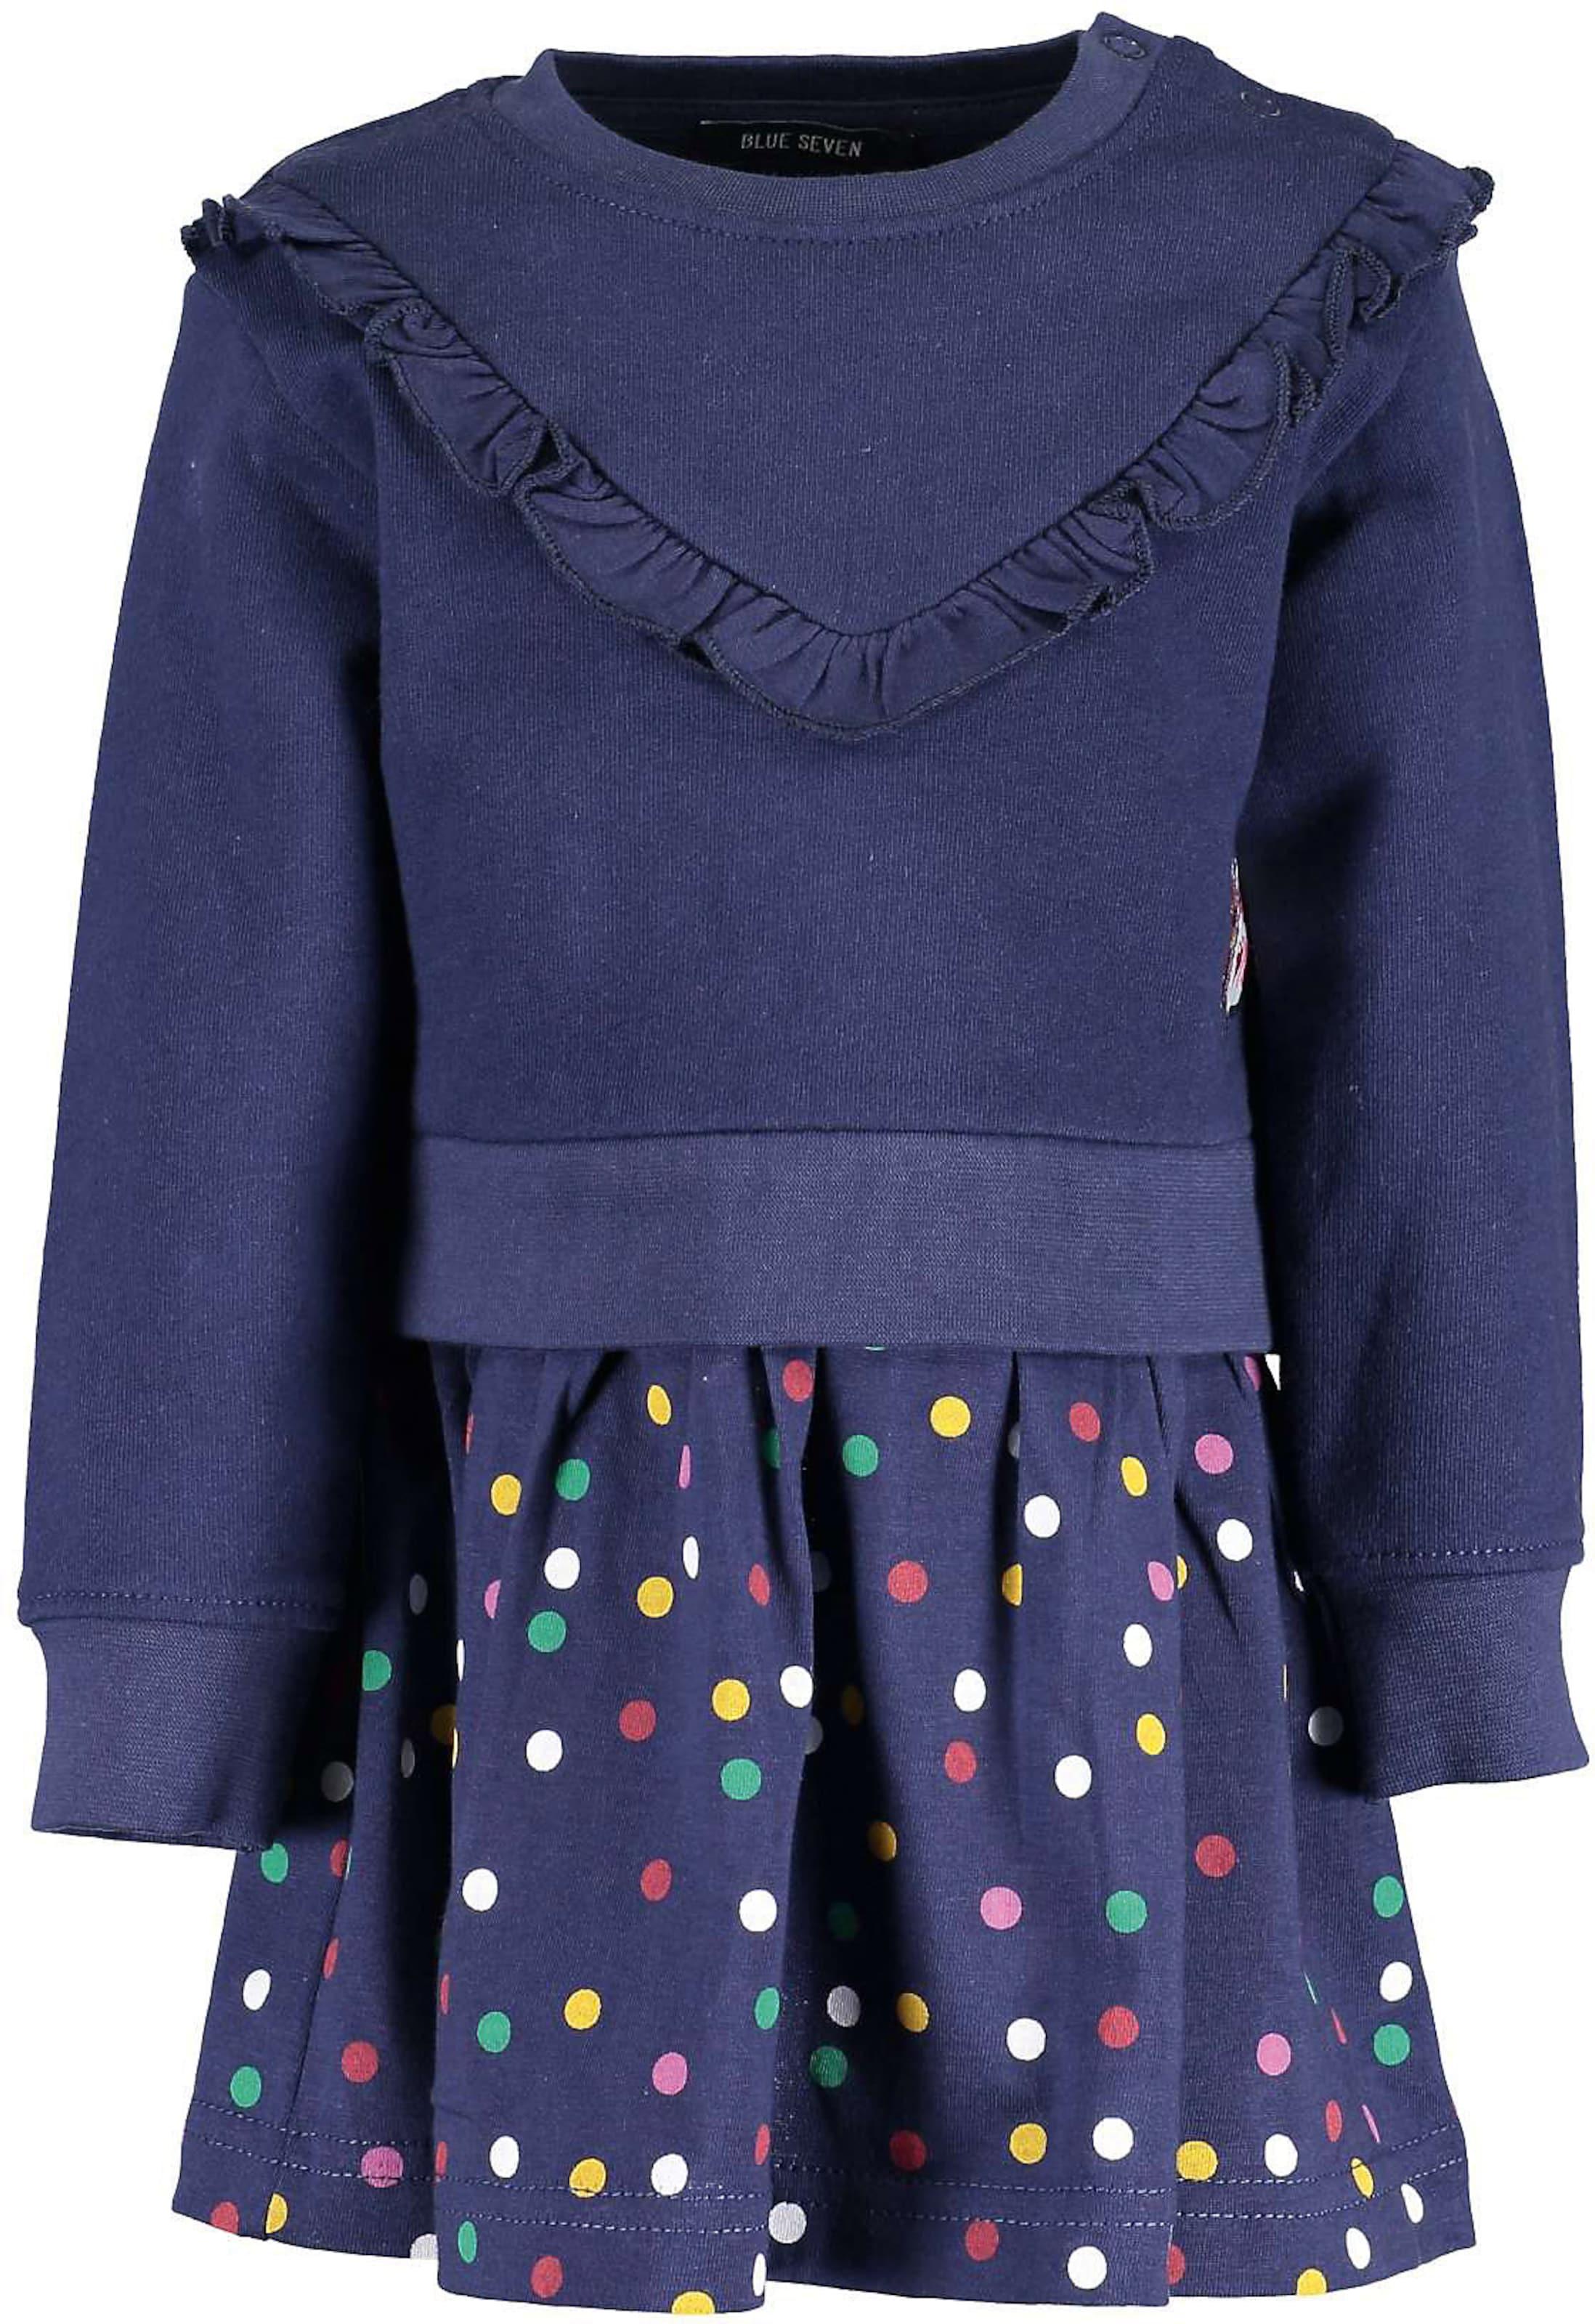 Kinder,  Mädchen,  Kinder BLUE SEVEN Sweatkleid blau | 04055852692695